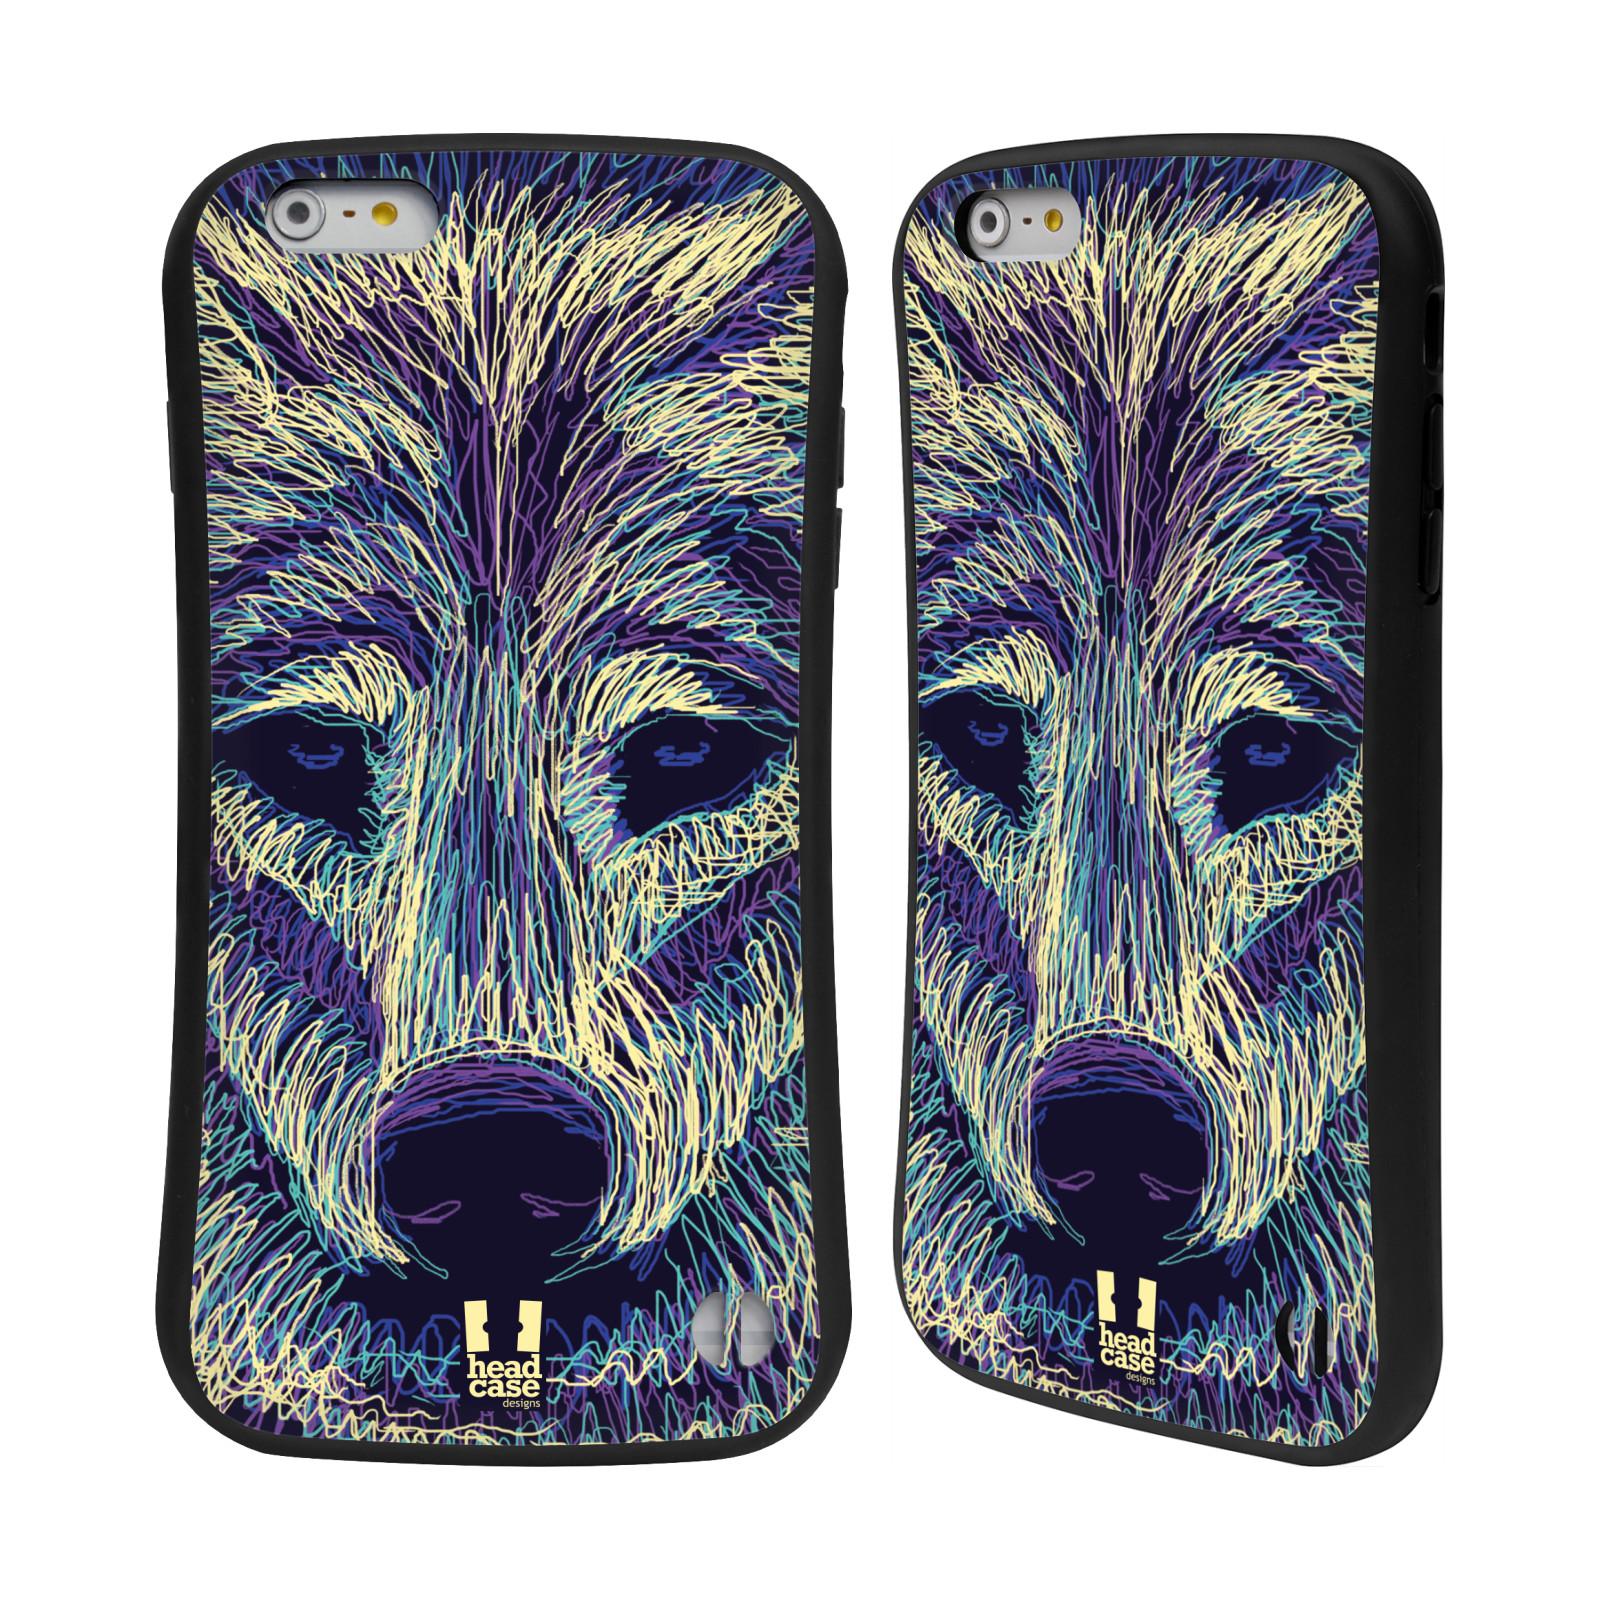 HEAD CASE silikon/plast odolný obal na mobil Apple Iphone 6 PLUS / 6S PLUS vzor zvíře čmáranice vlk